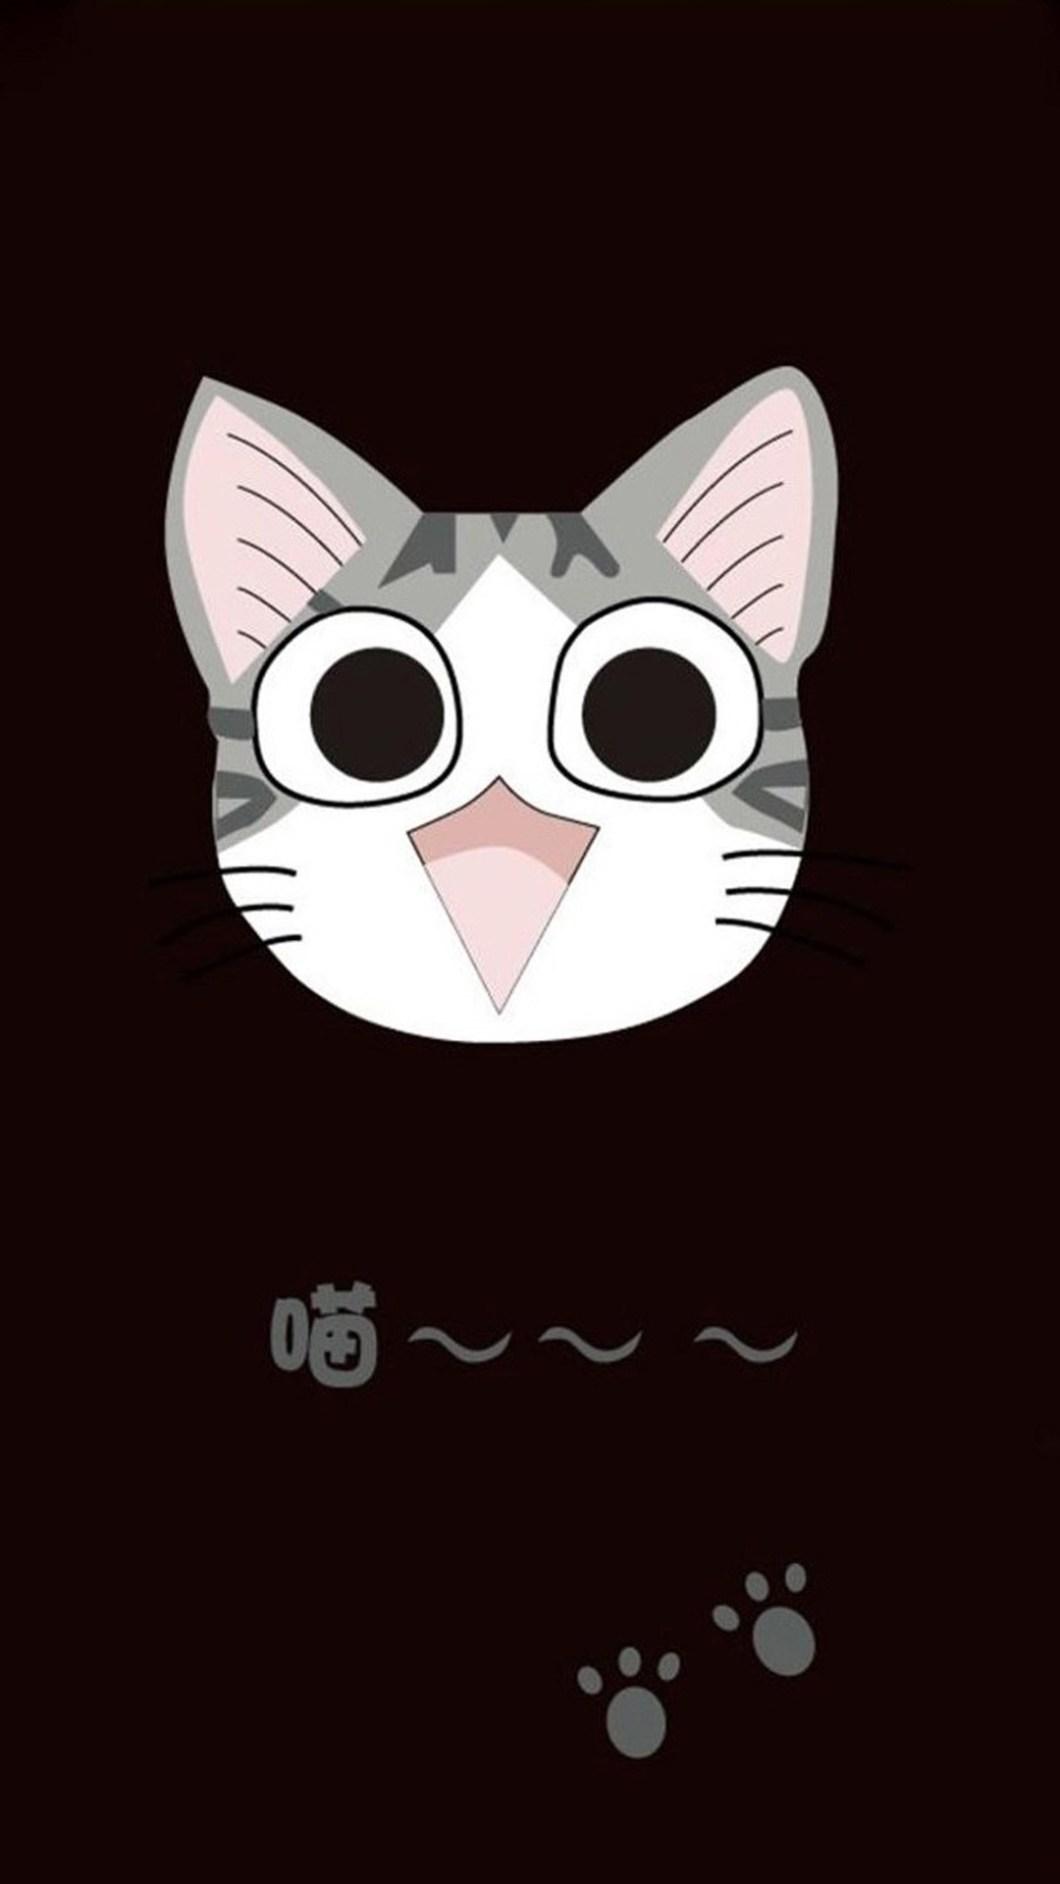 Cute Anime Cat Wallpaper Iphone